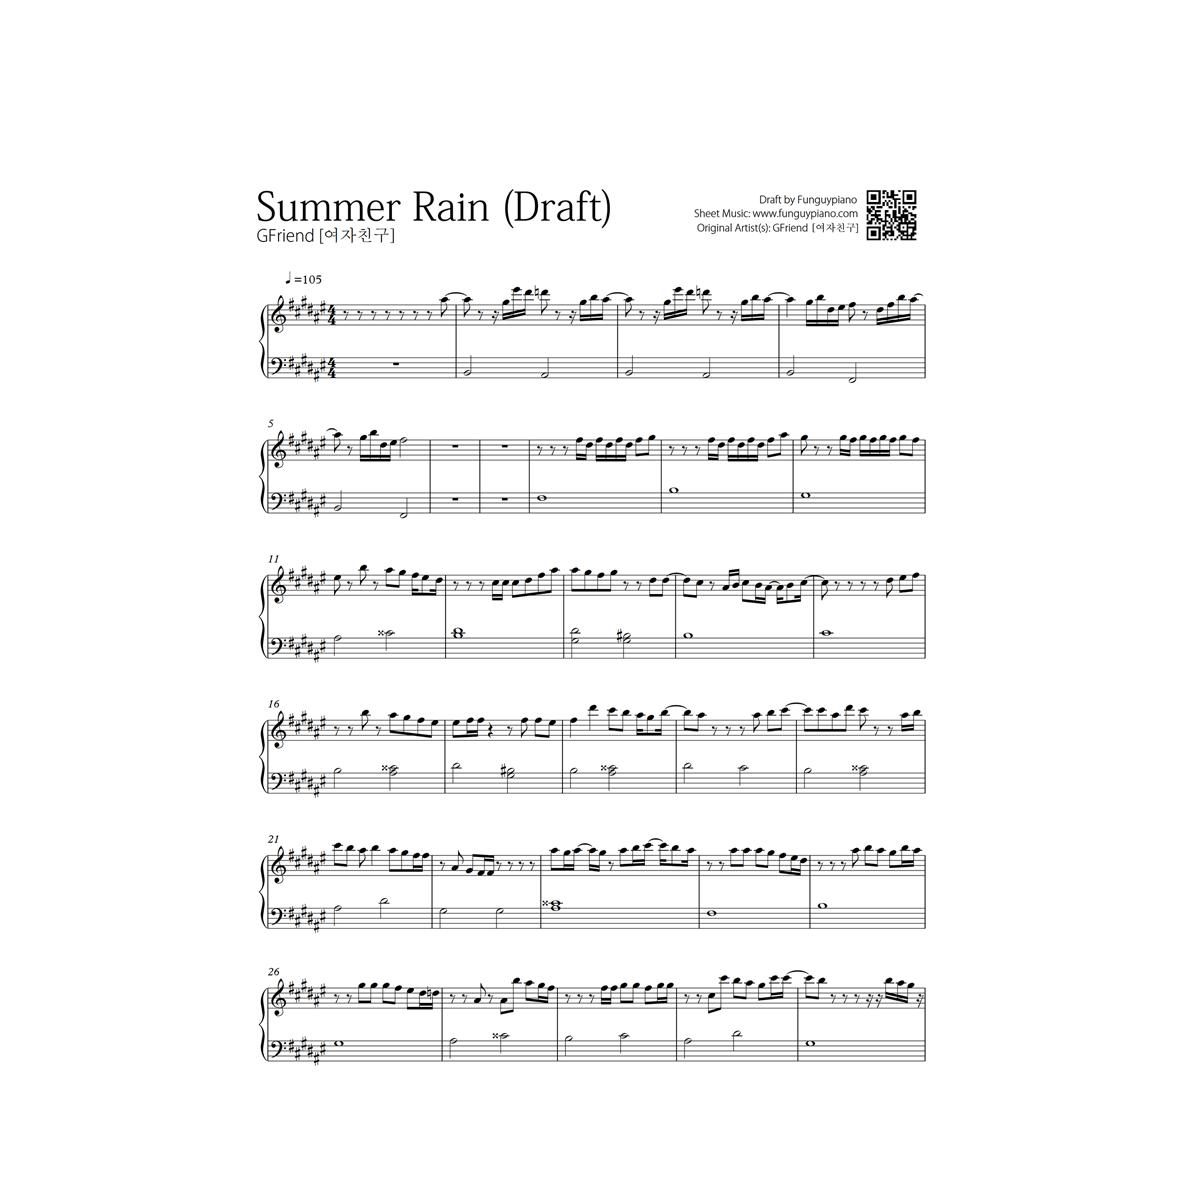 Gfriend Summer Rain Free Piano Sheet Funguypiano